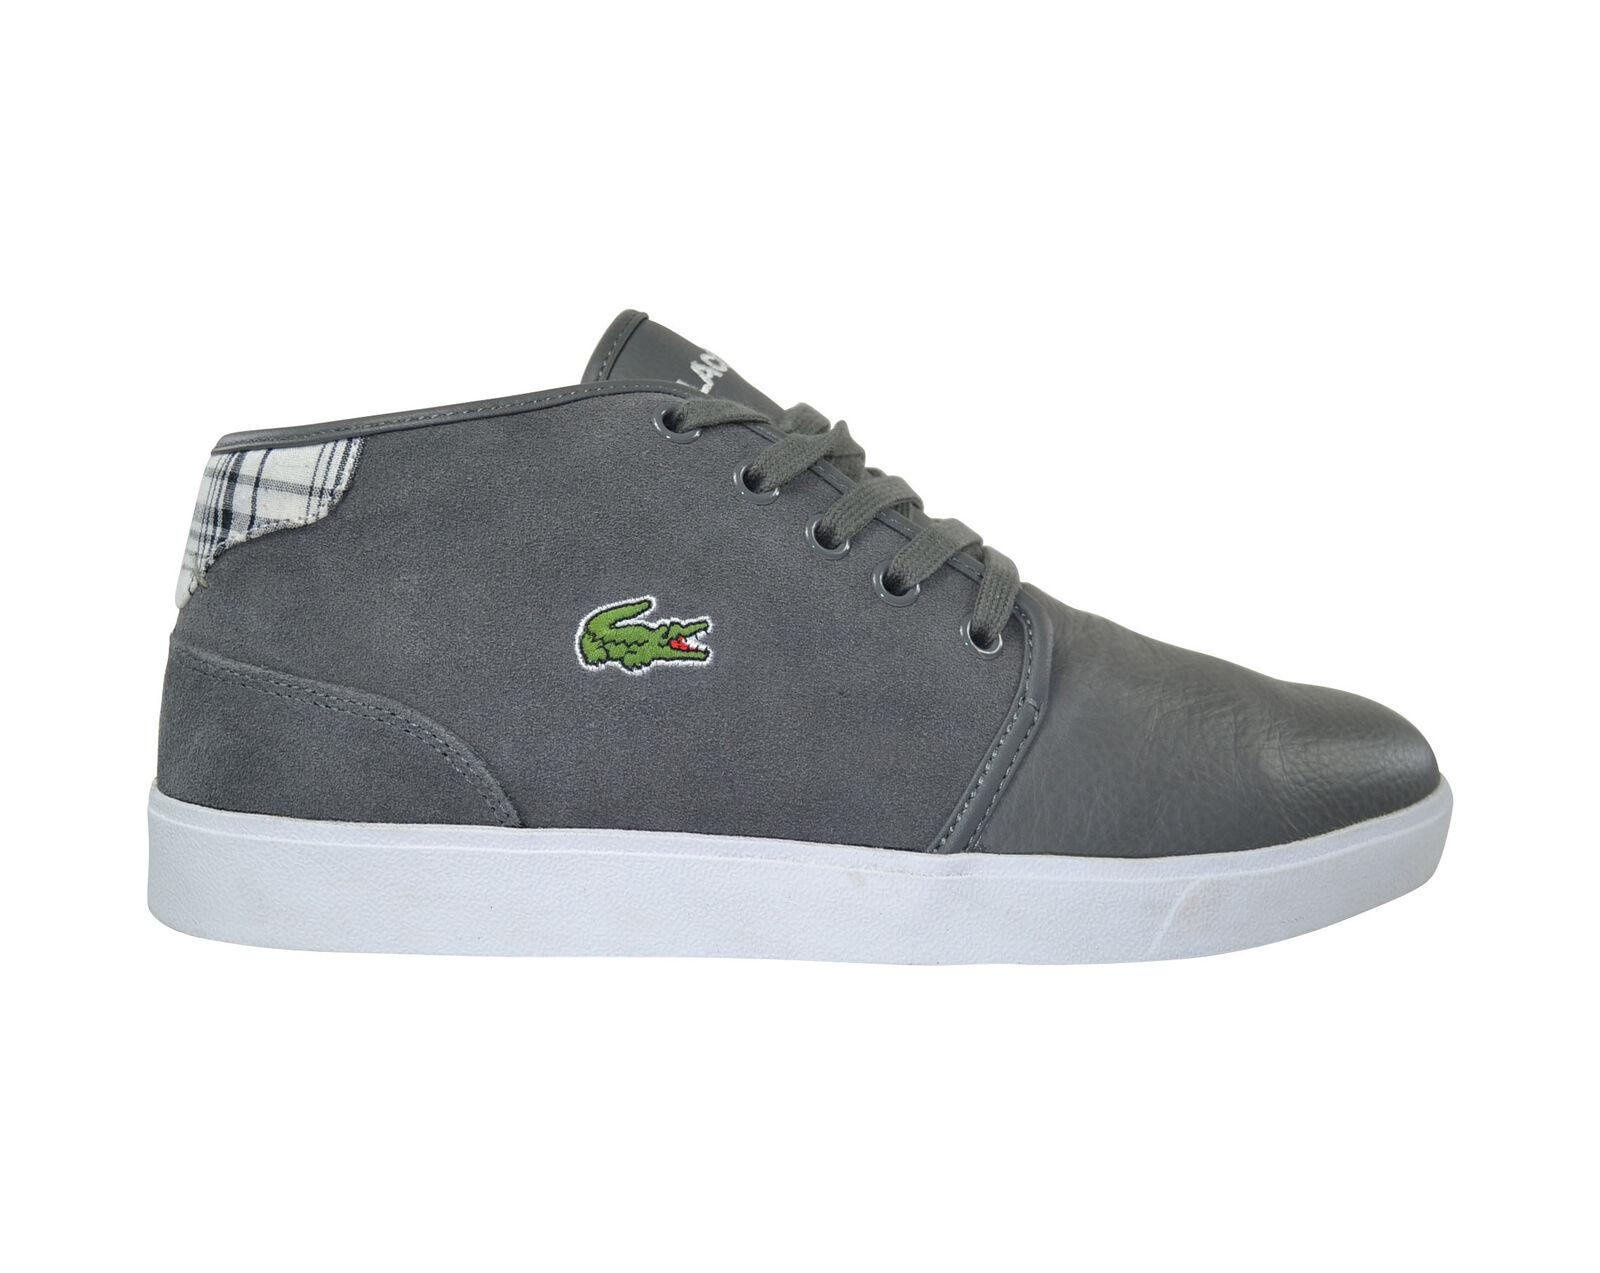 Lacoste benoit bhh SPM DK gris zapatos gris tamaños de selección